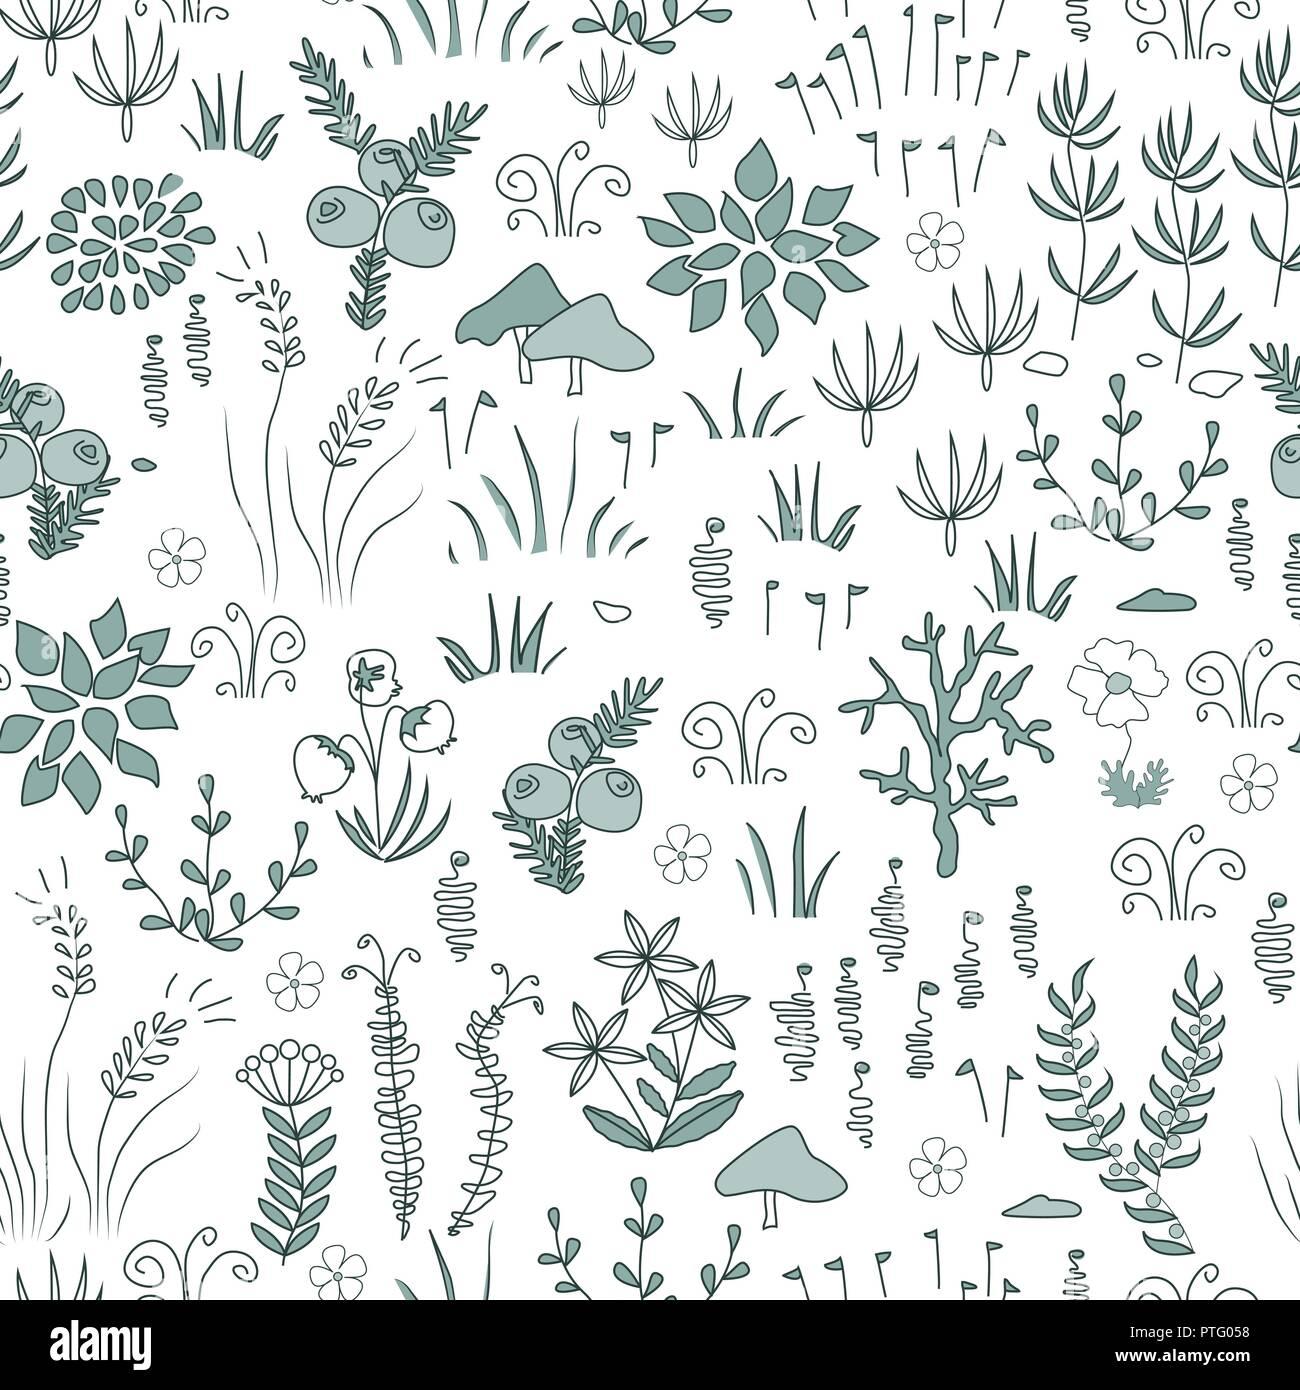 Nordic Pattern Imágenes De Stock & Nordic Pattern Fotos De Stock - Alamy